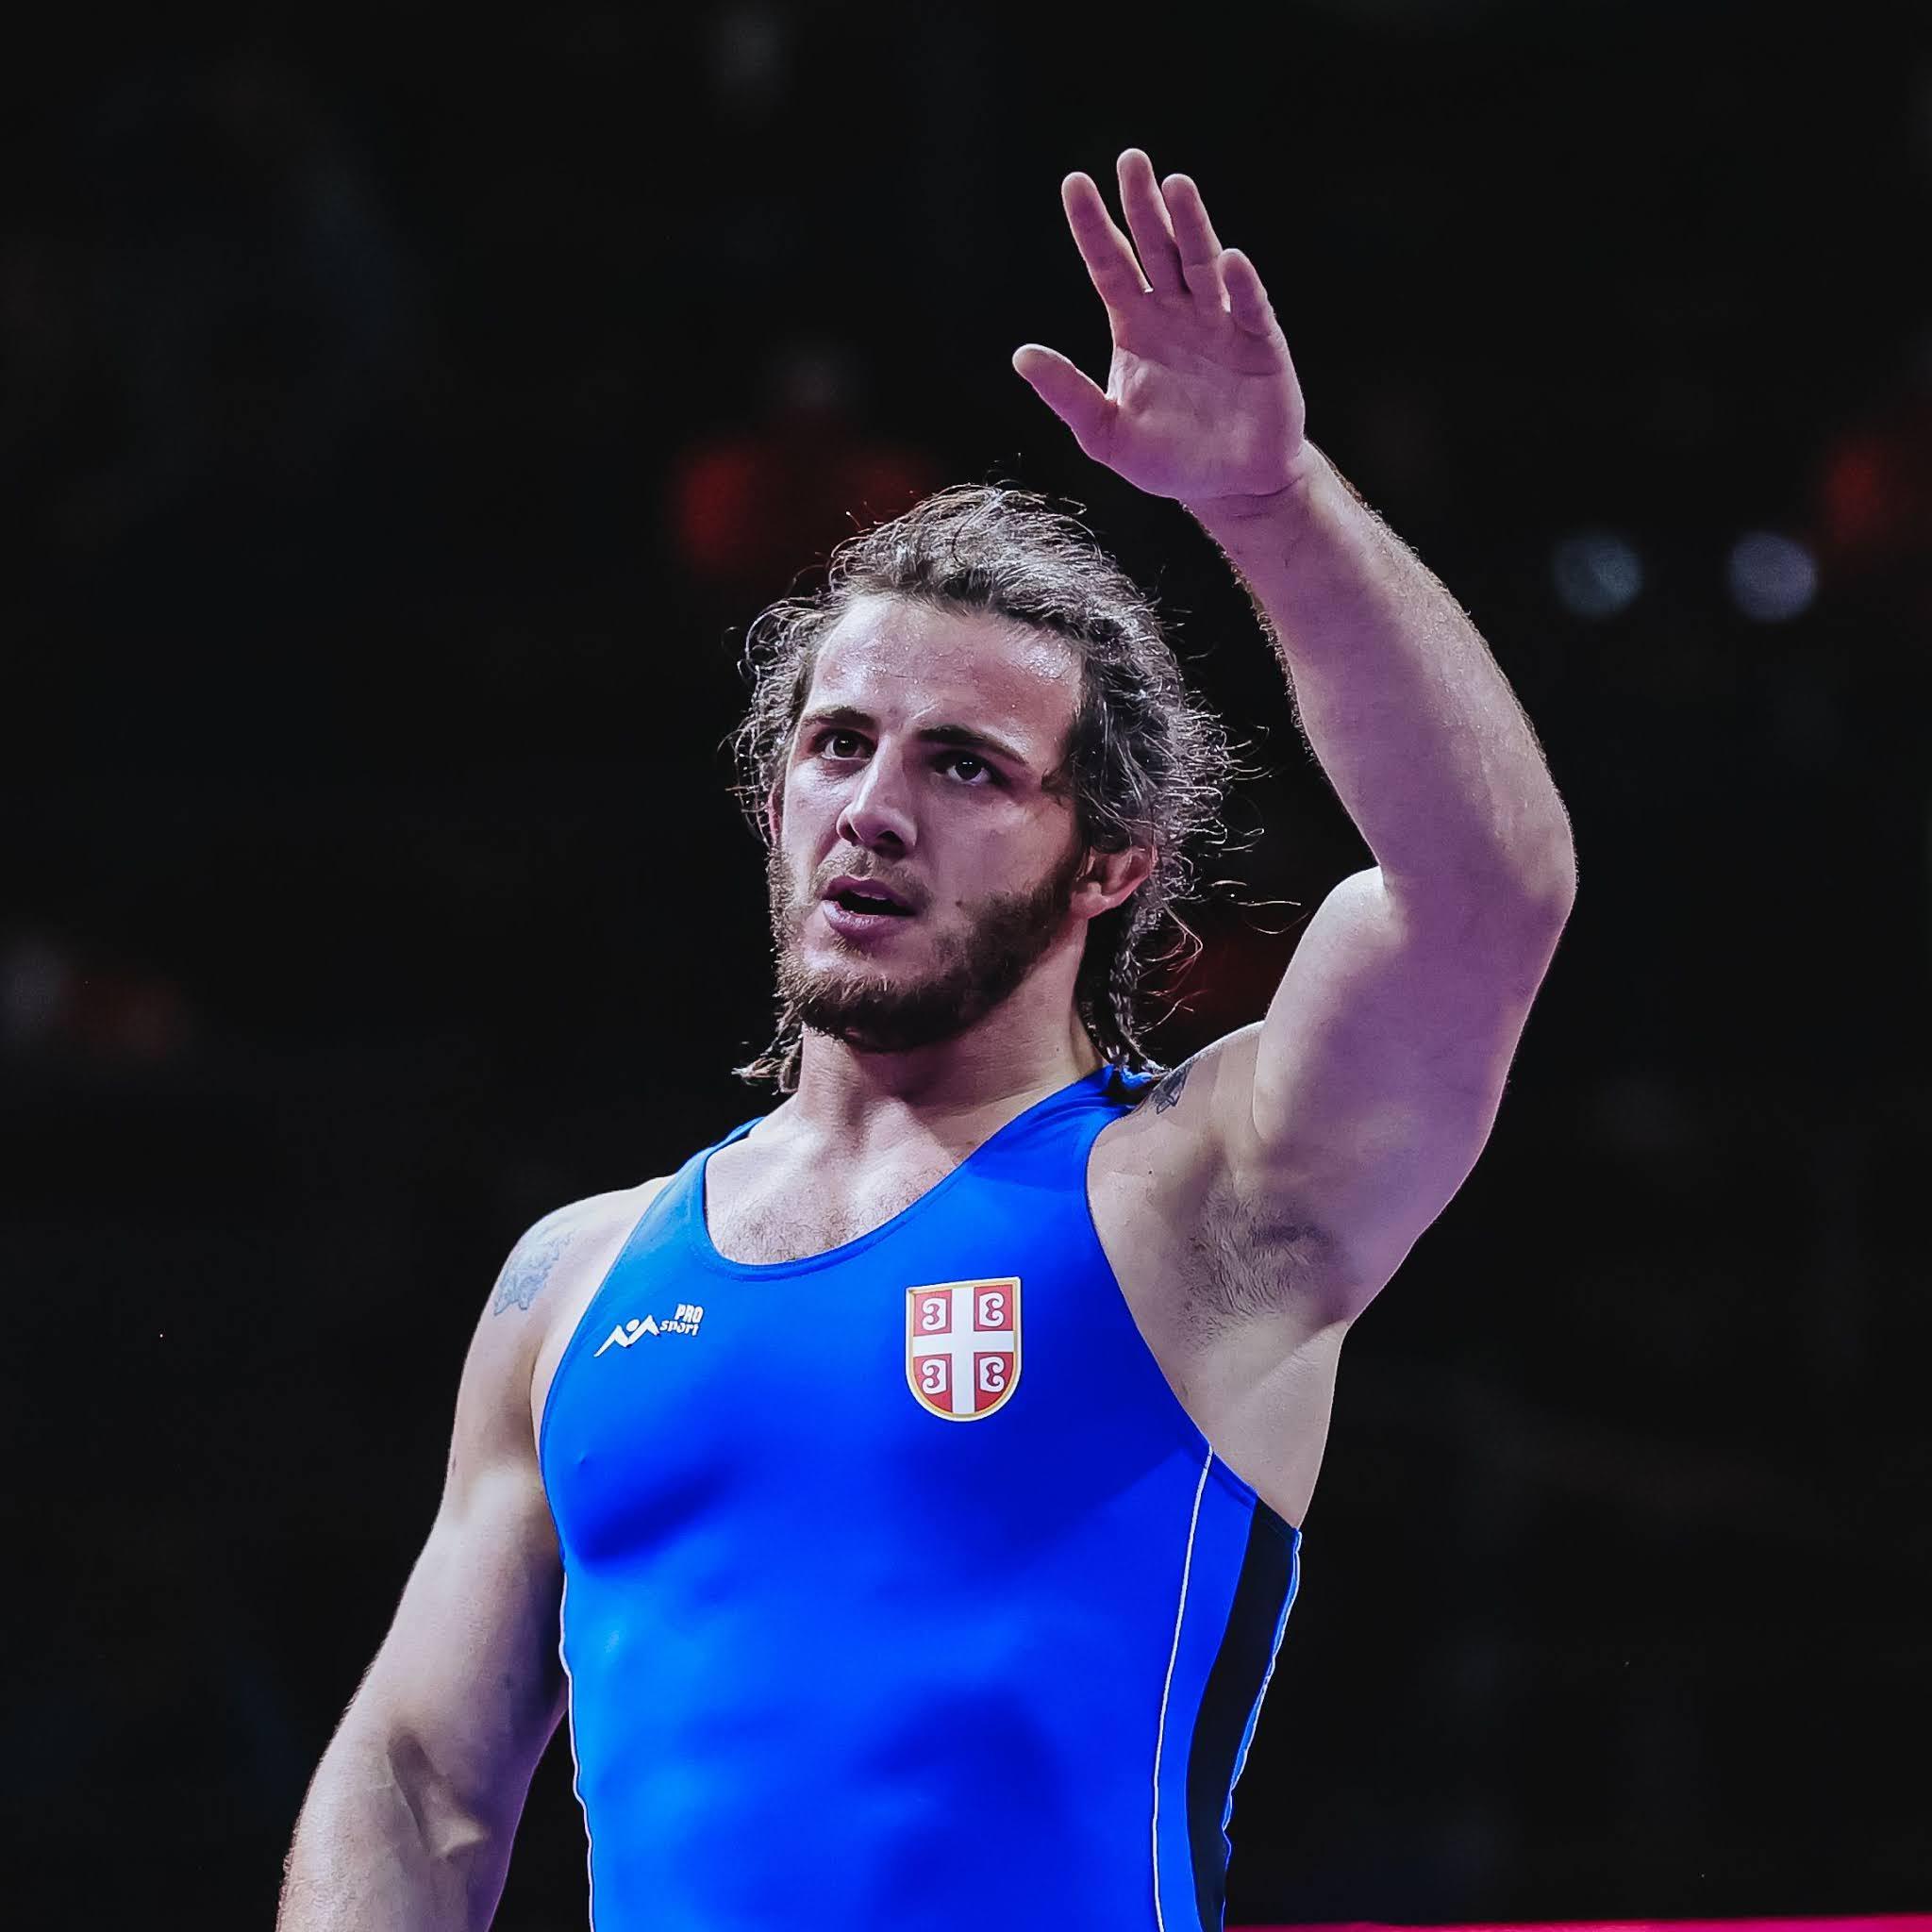 Zurab Datunashvili wrestling serbia luta greco-romana surpresa